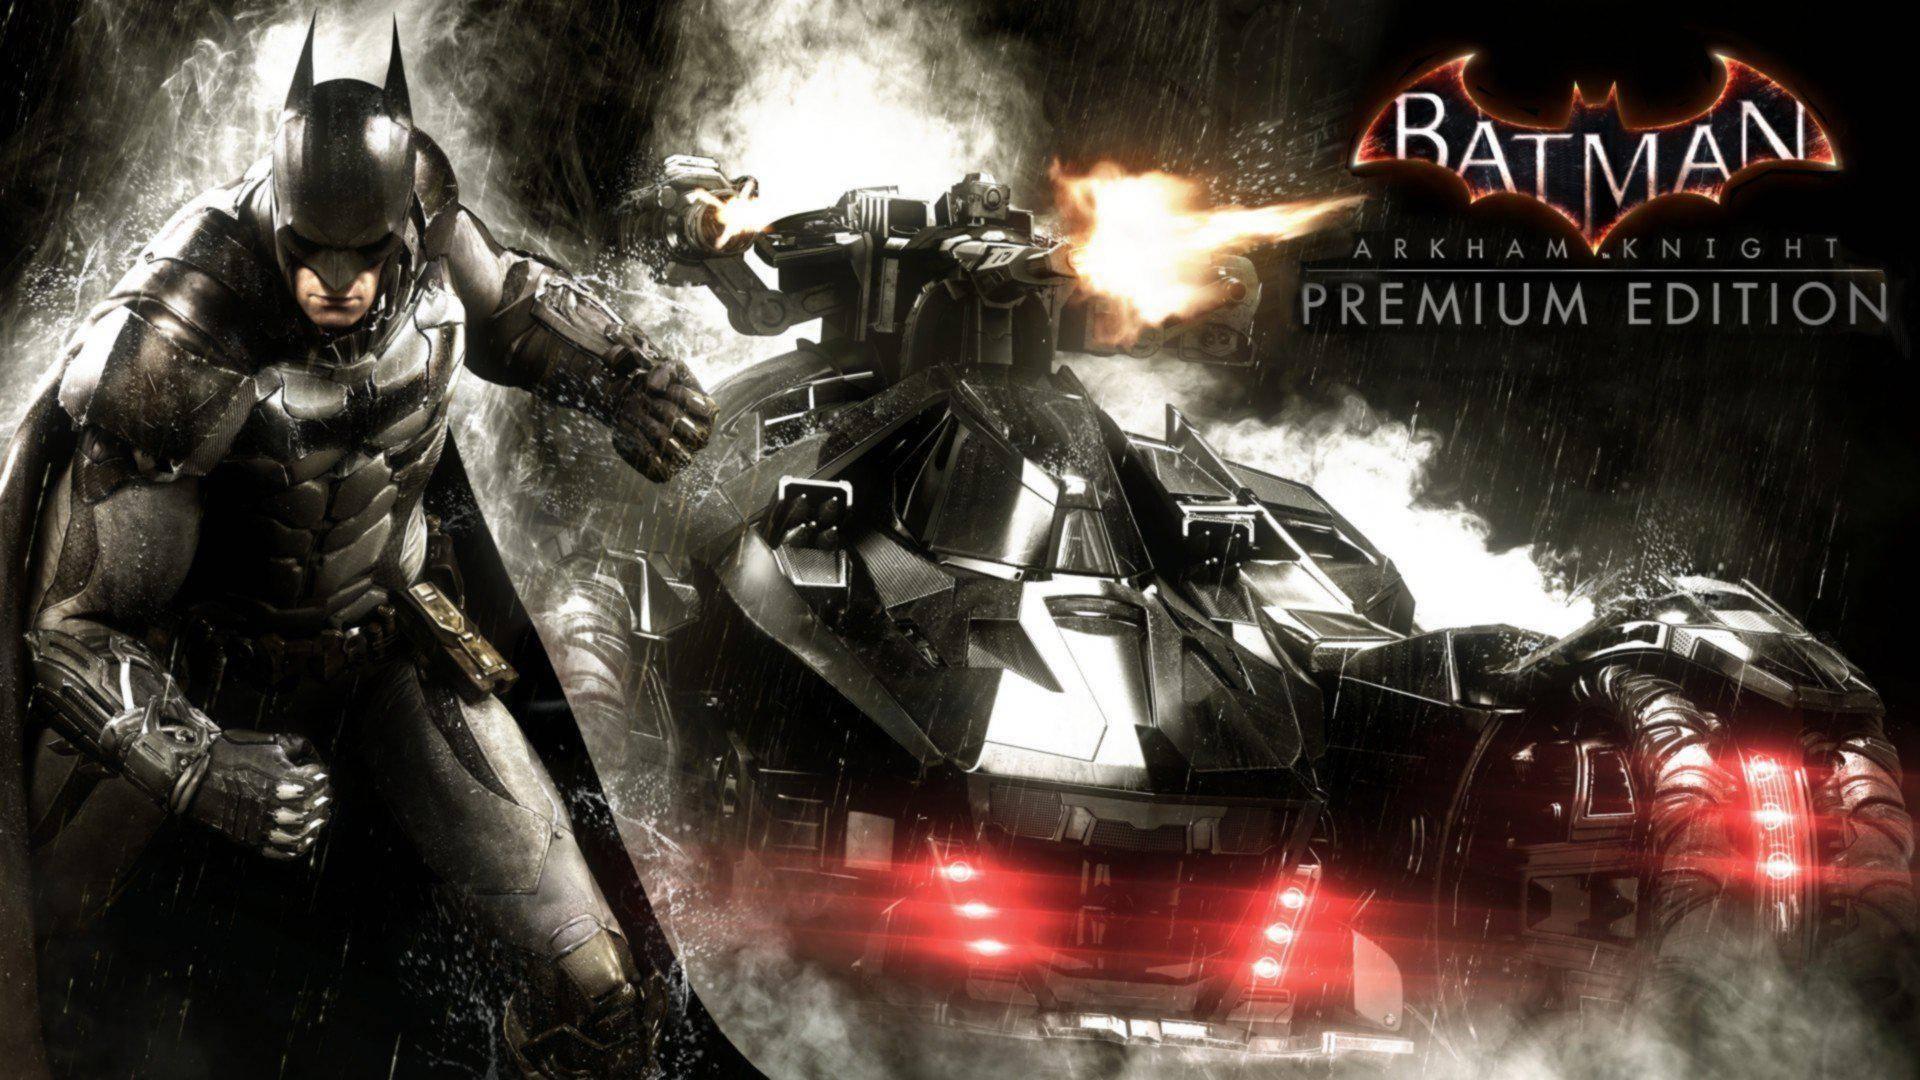 Batman: Arkham Knight Premium Edition CD Key + Crack PC Game Free Download